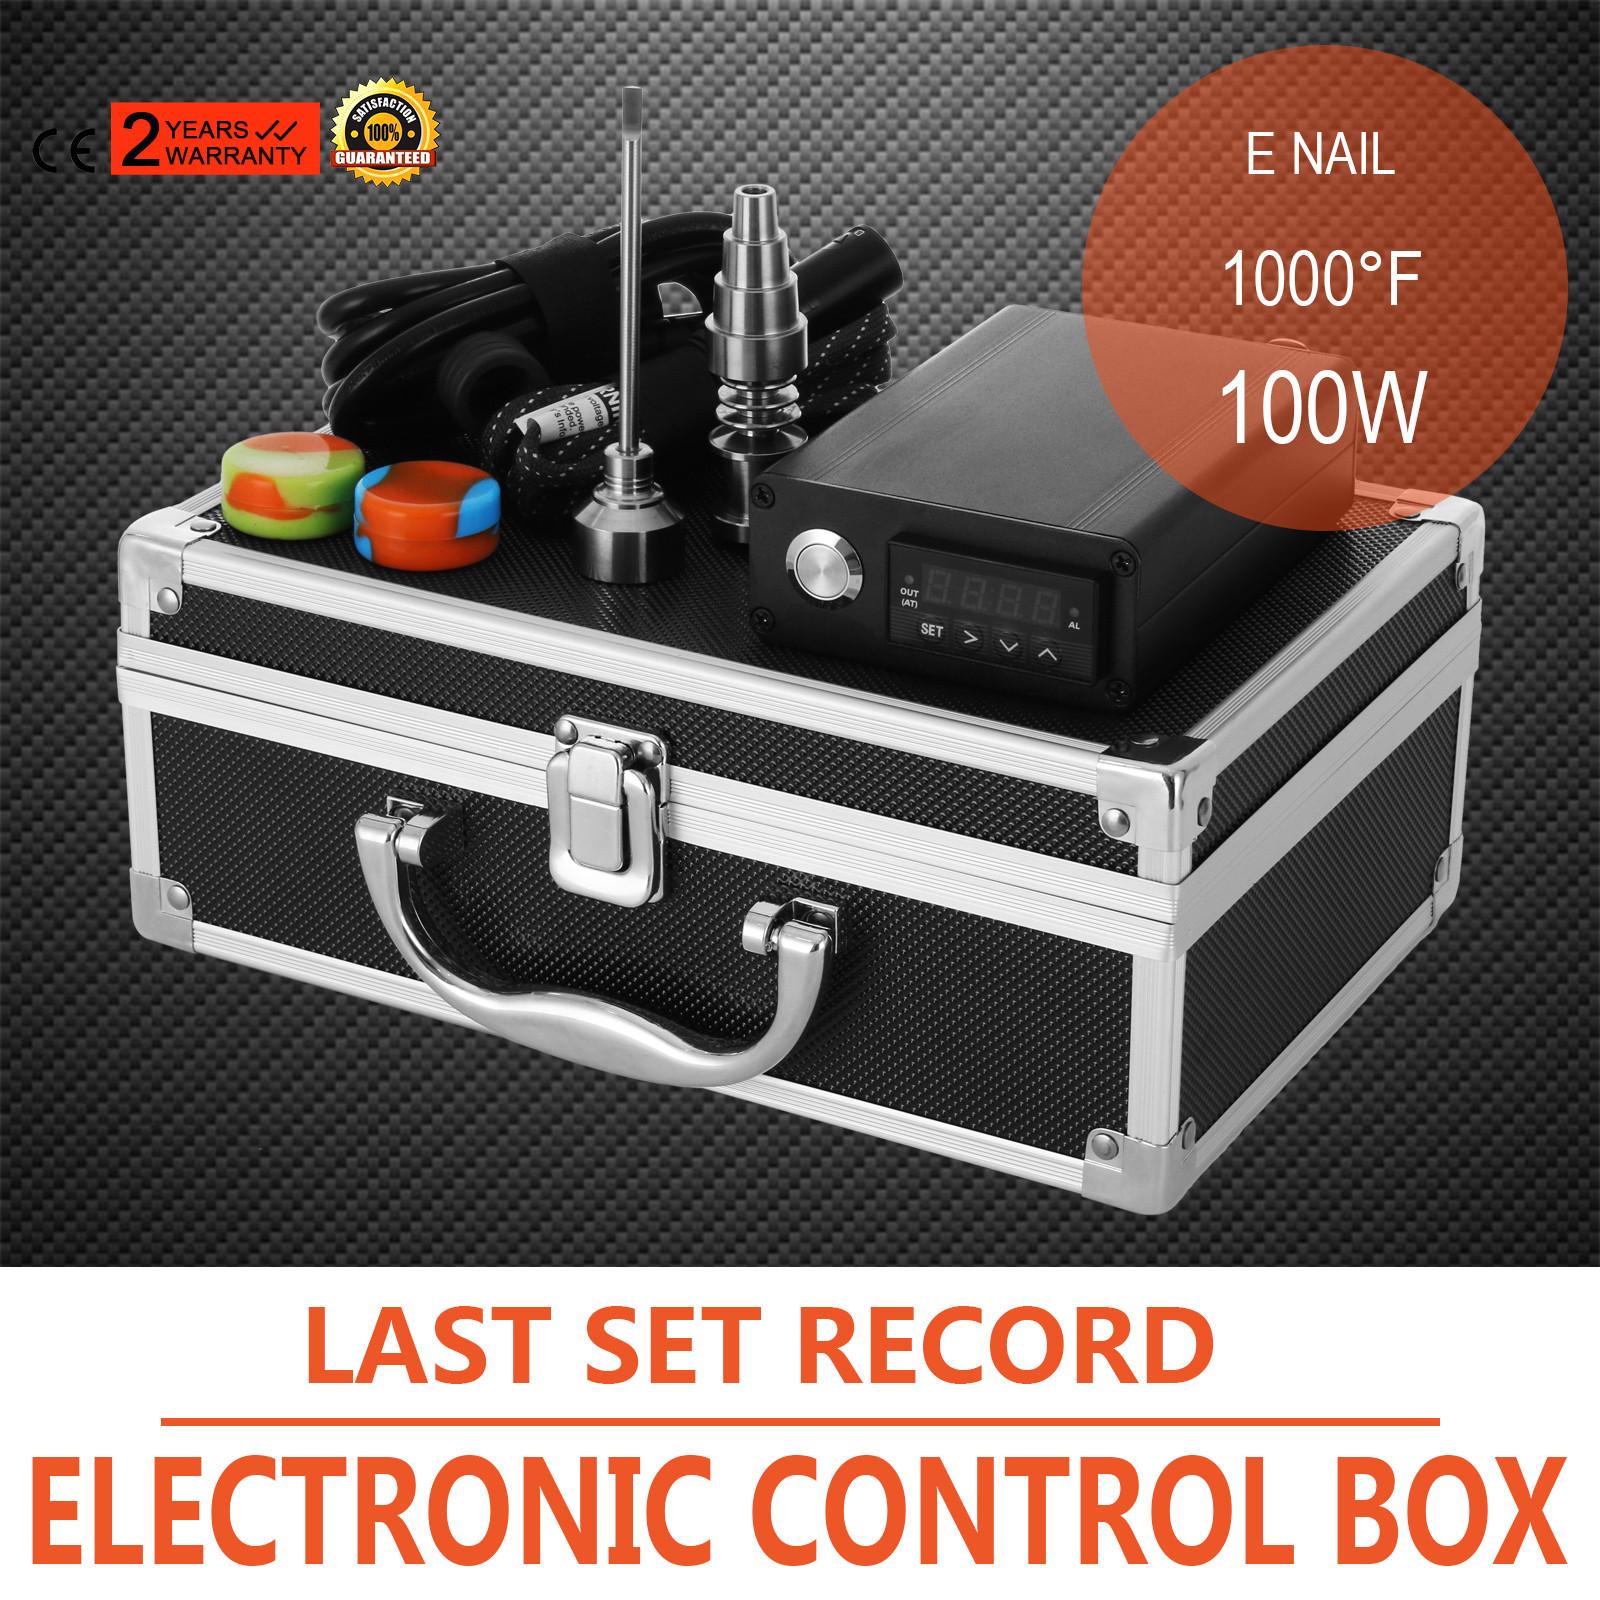 Enail Titanium E nail Electronic Control Box E nail   More Dab Set  #B93712